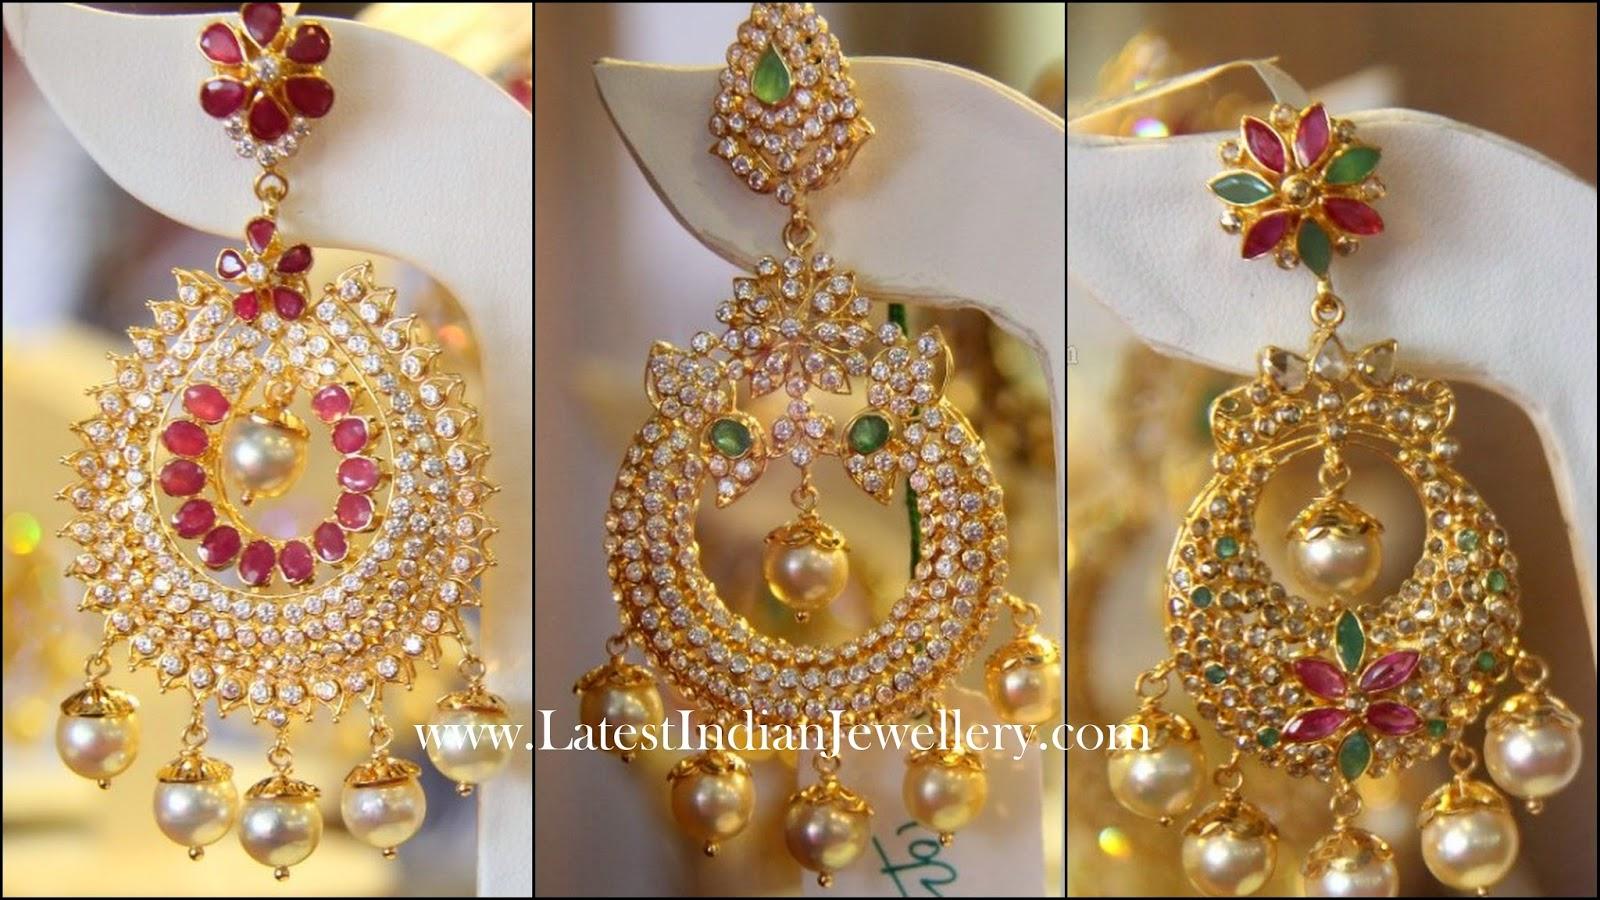 Latest Designer Heavy Chand Bali Earrings Latest Indian